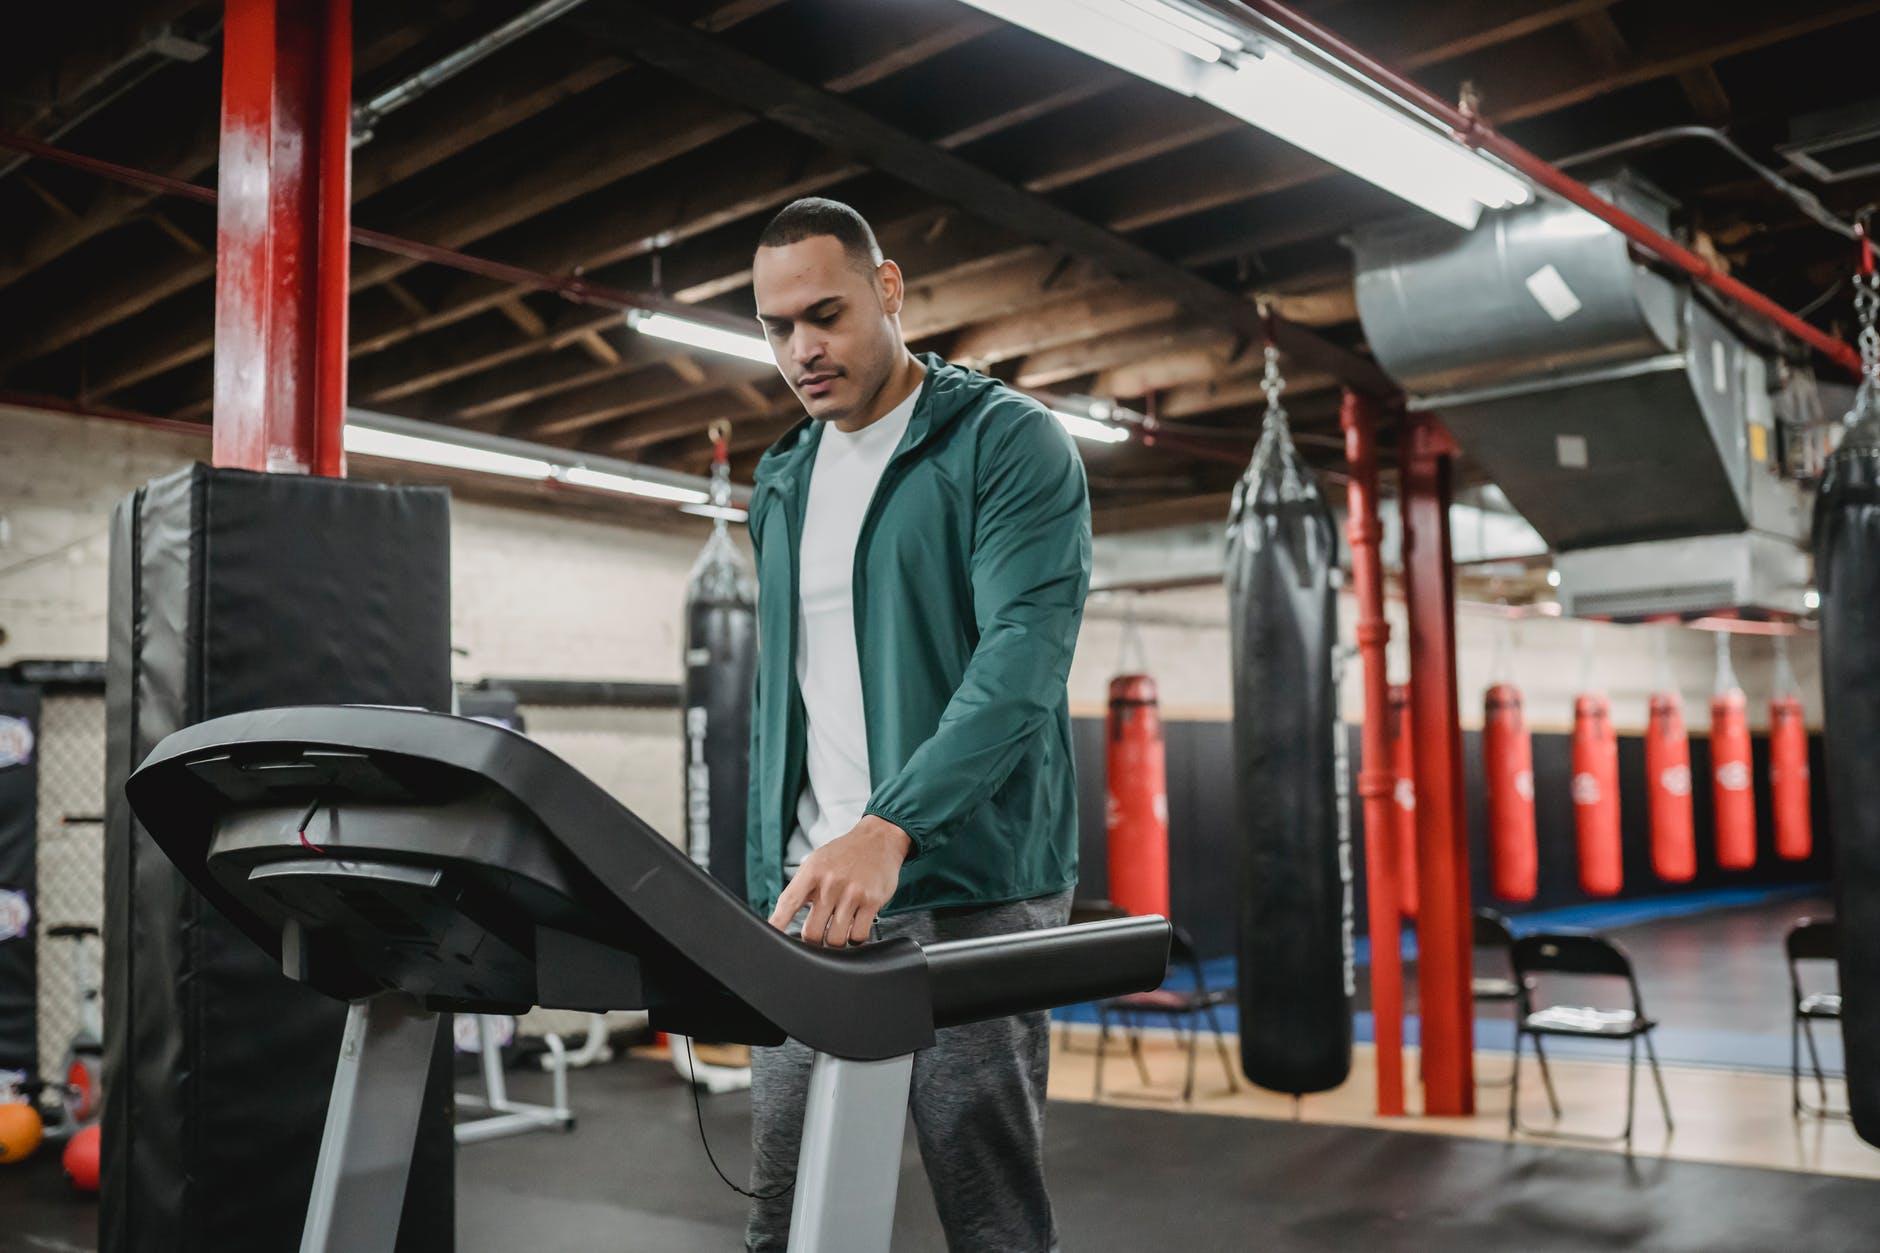 treadmill, yescomusa